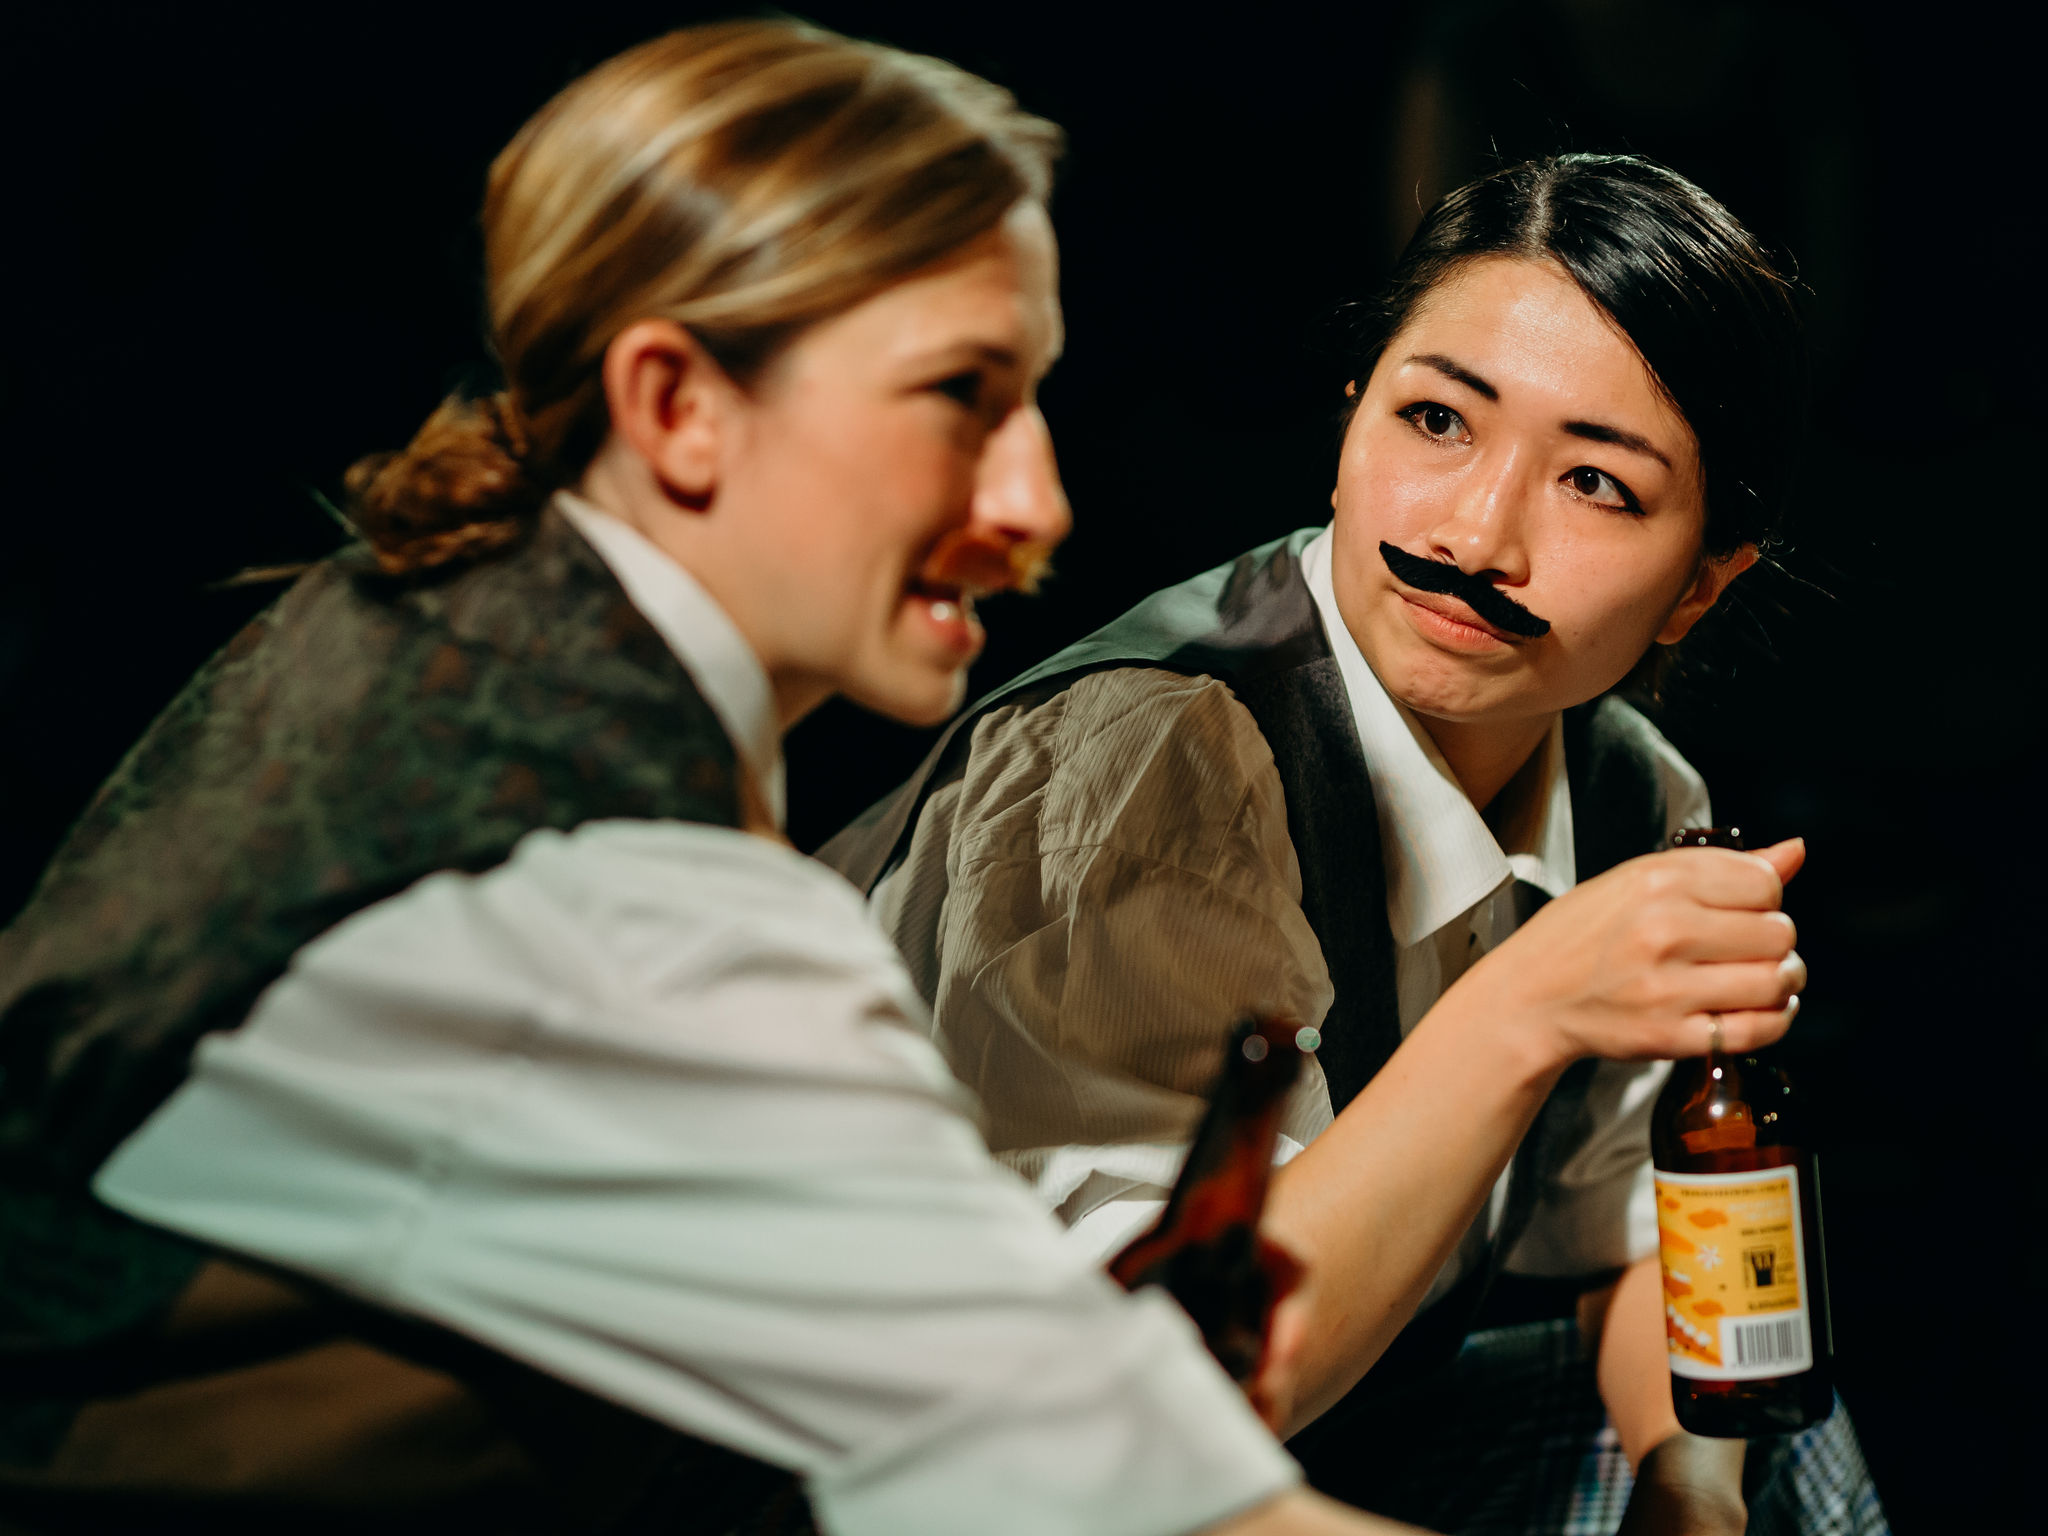 Aimee Marich as Rosencrantz and Lansy Feng as Guildenstern. Image: Jack Dixon-Gunn